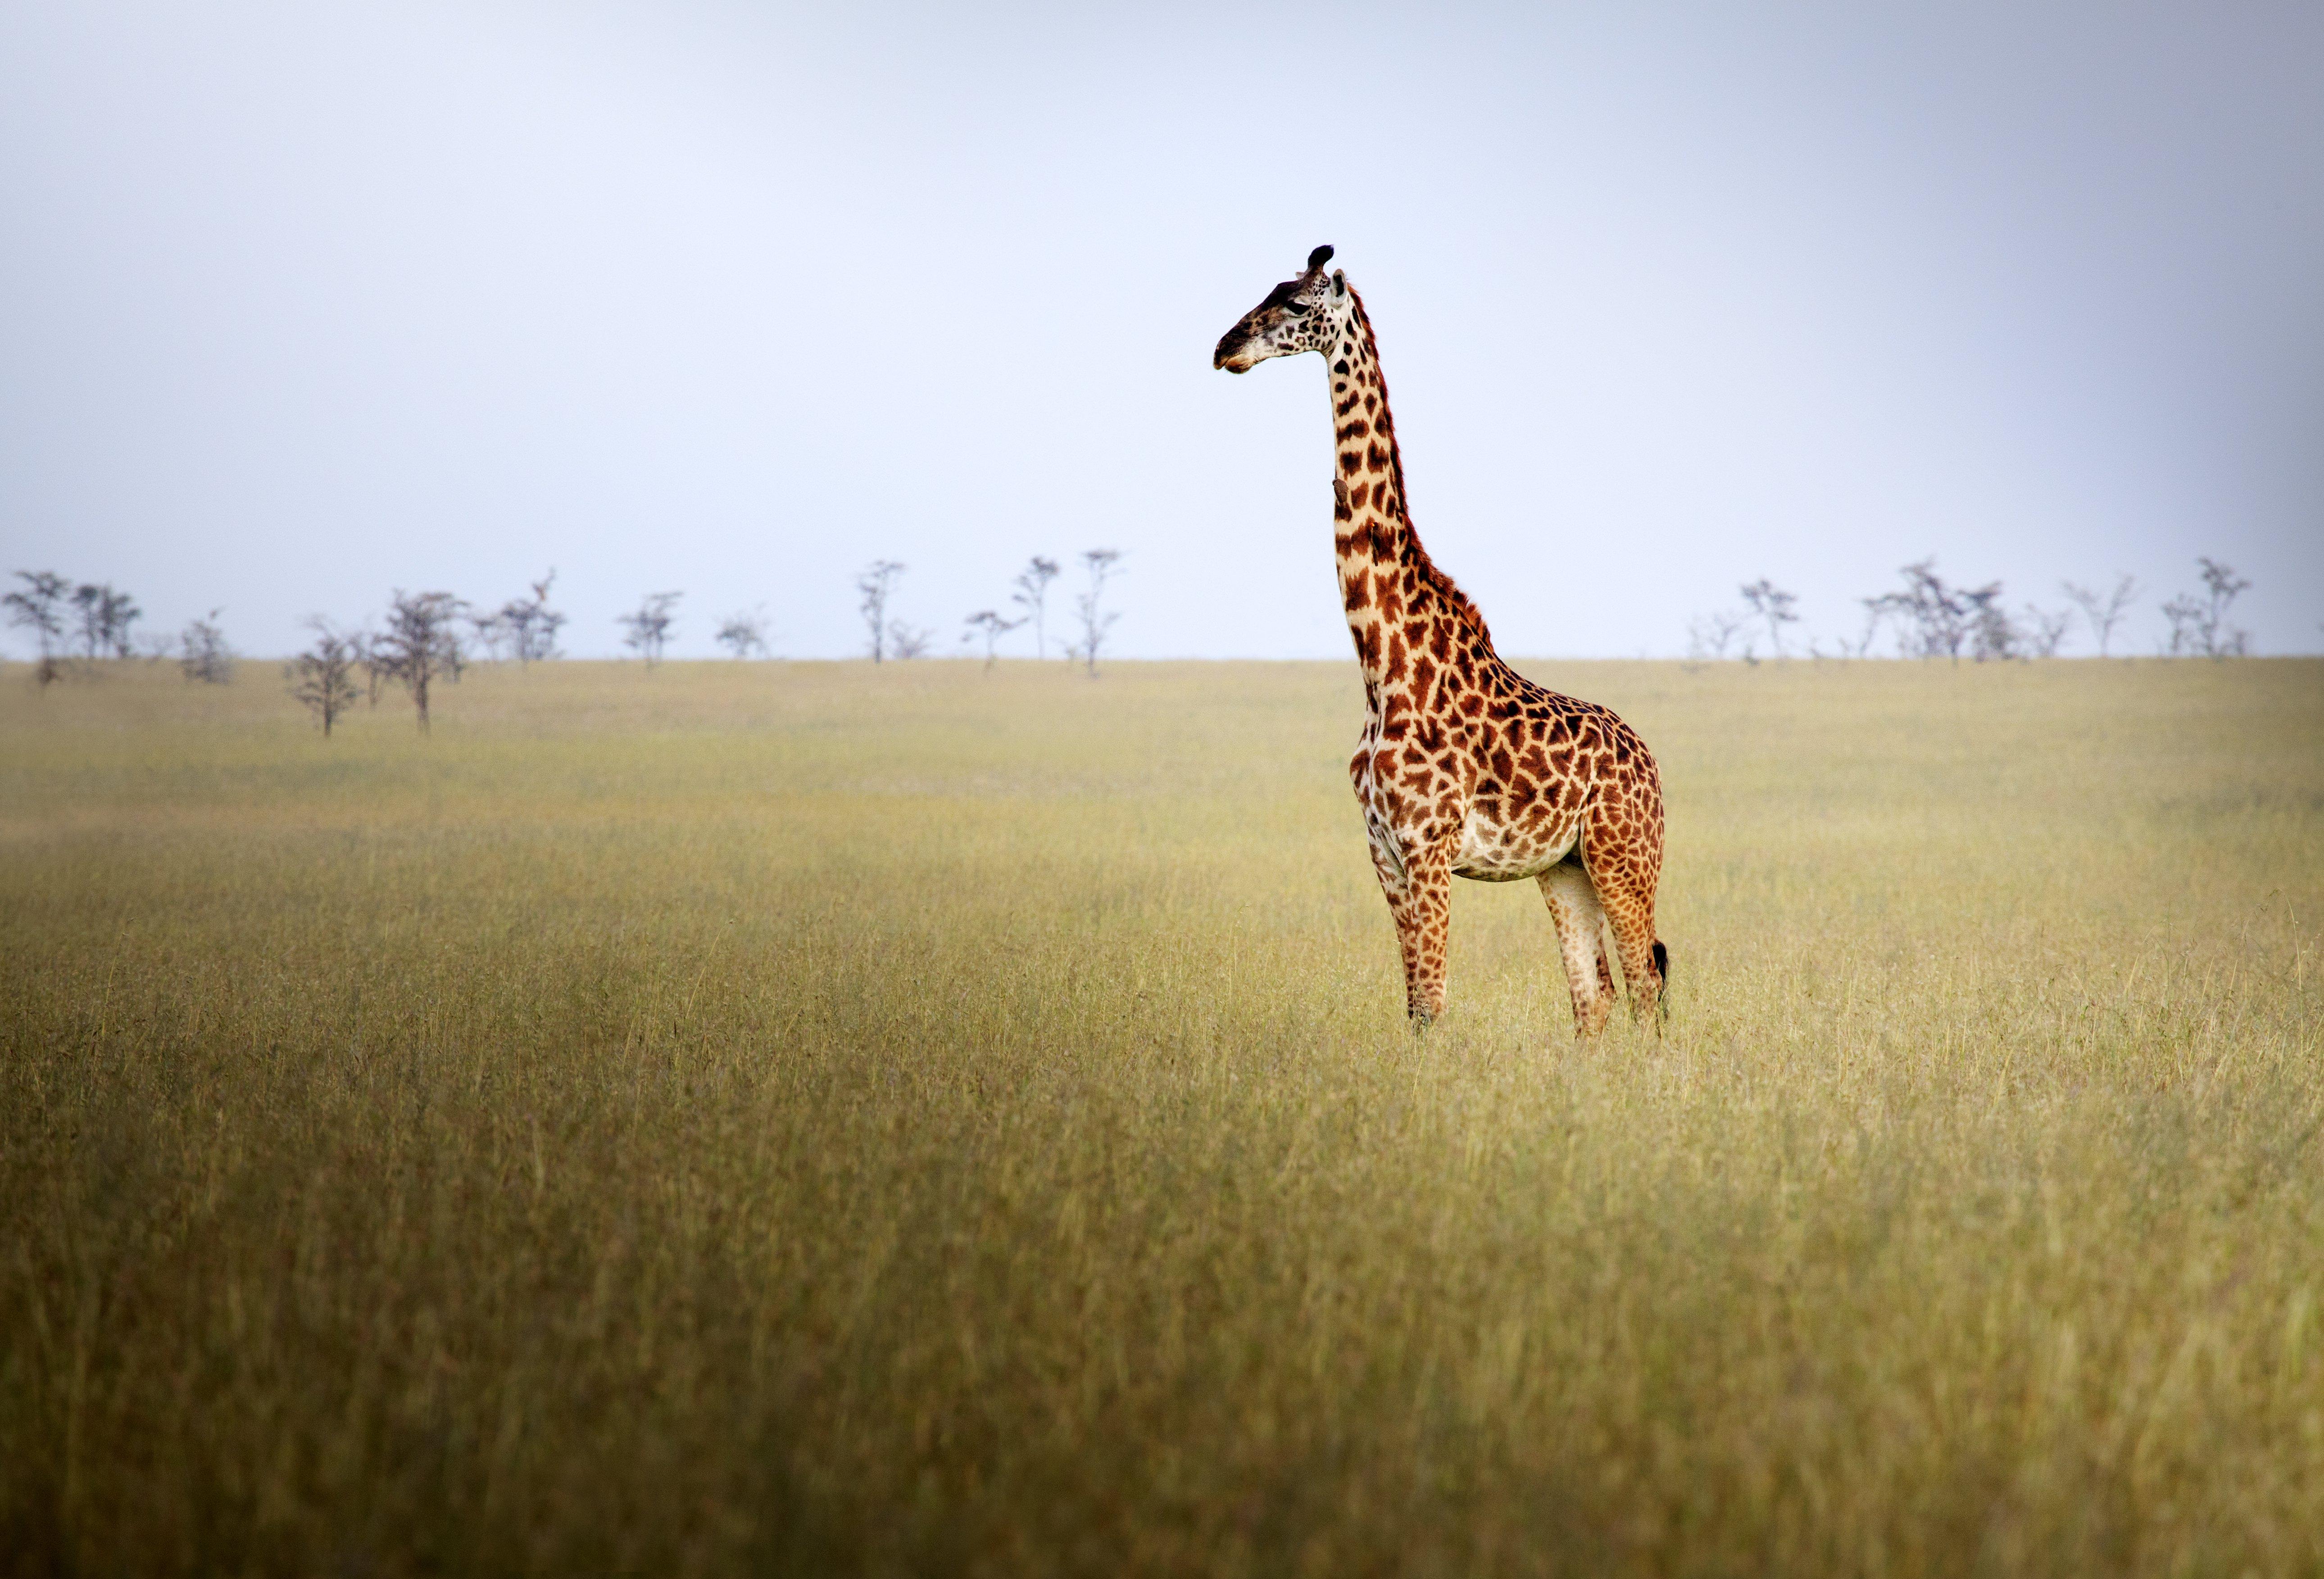 Giraffe High Quality Background on Wallpapers Vista